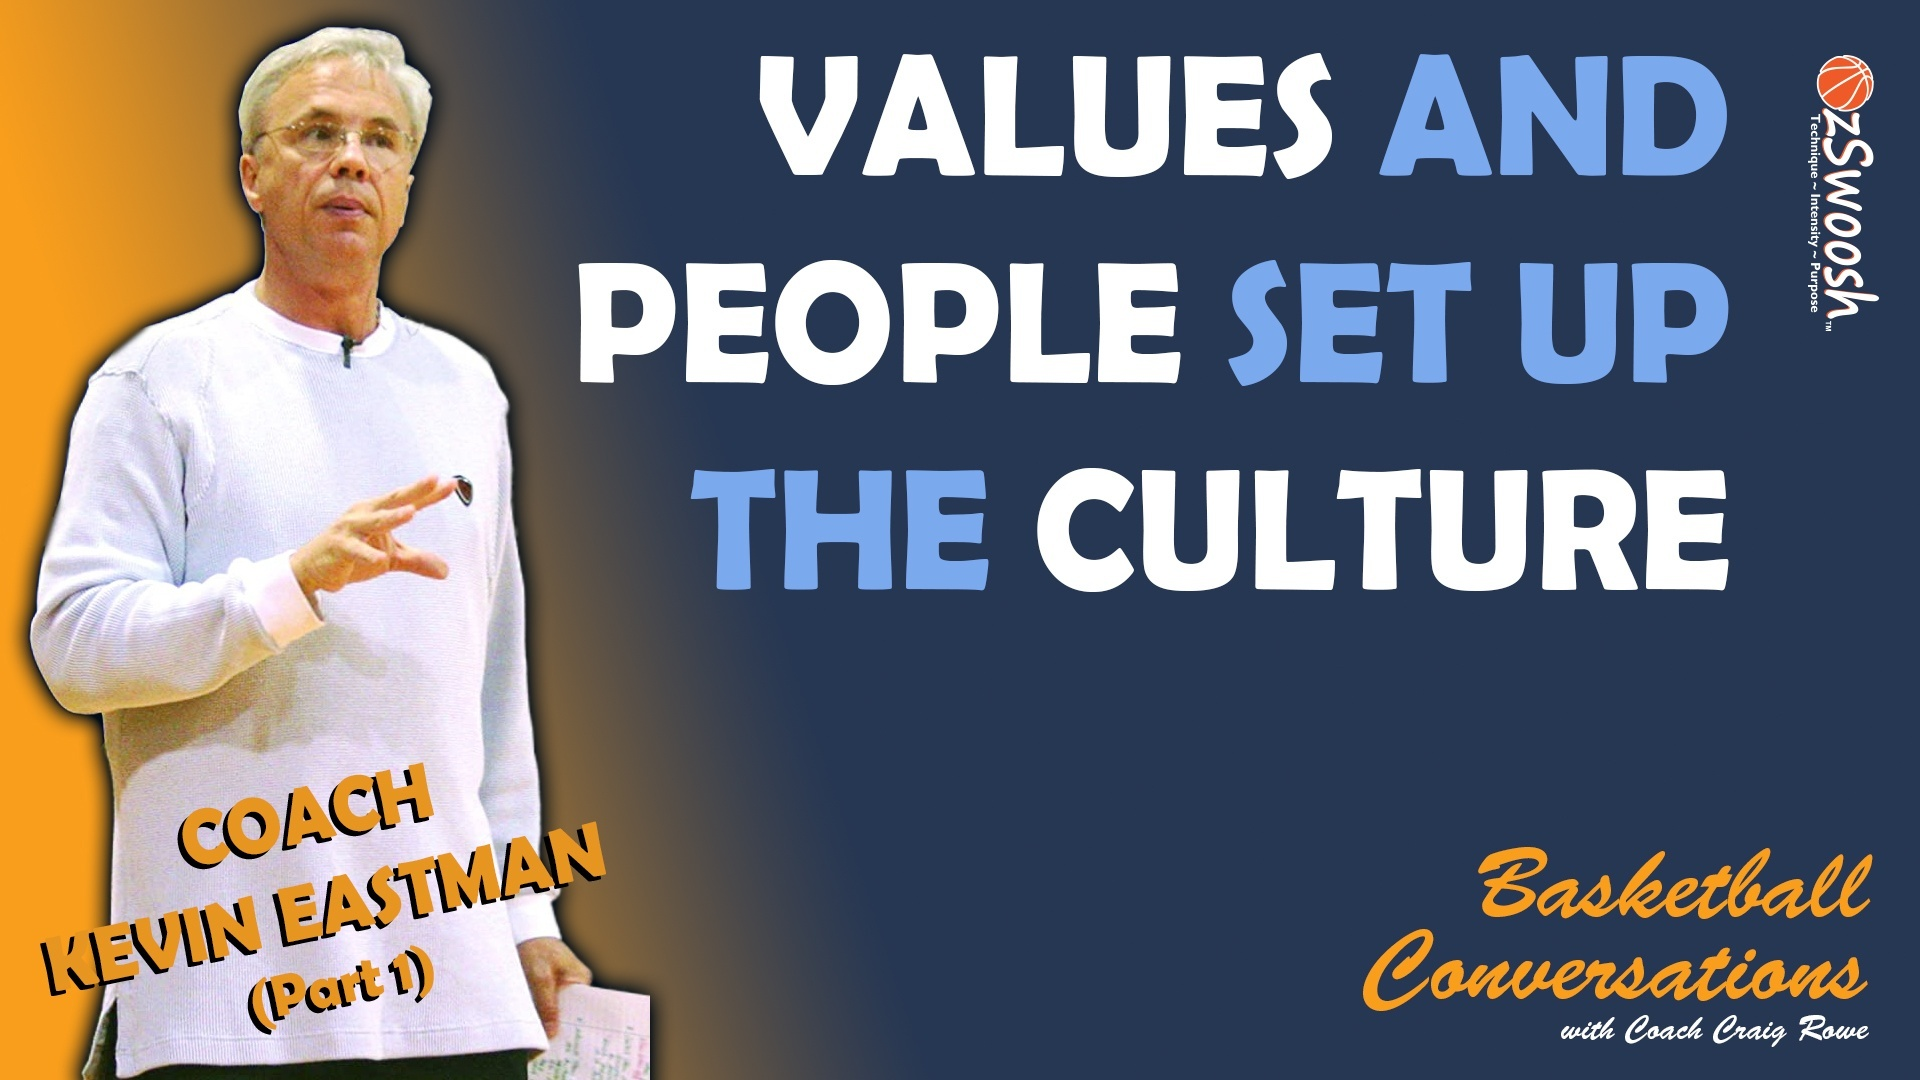 Building Team Culture - Kevin Eastman (OzSwoosh)